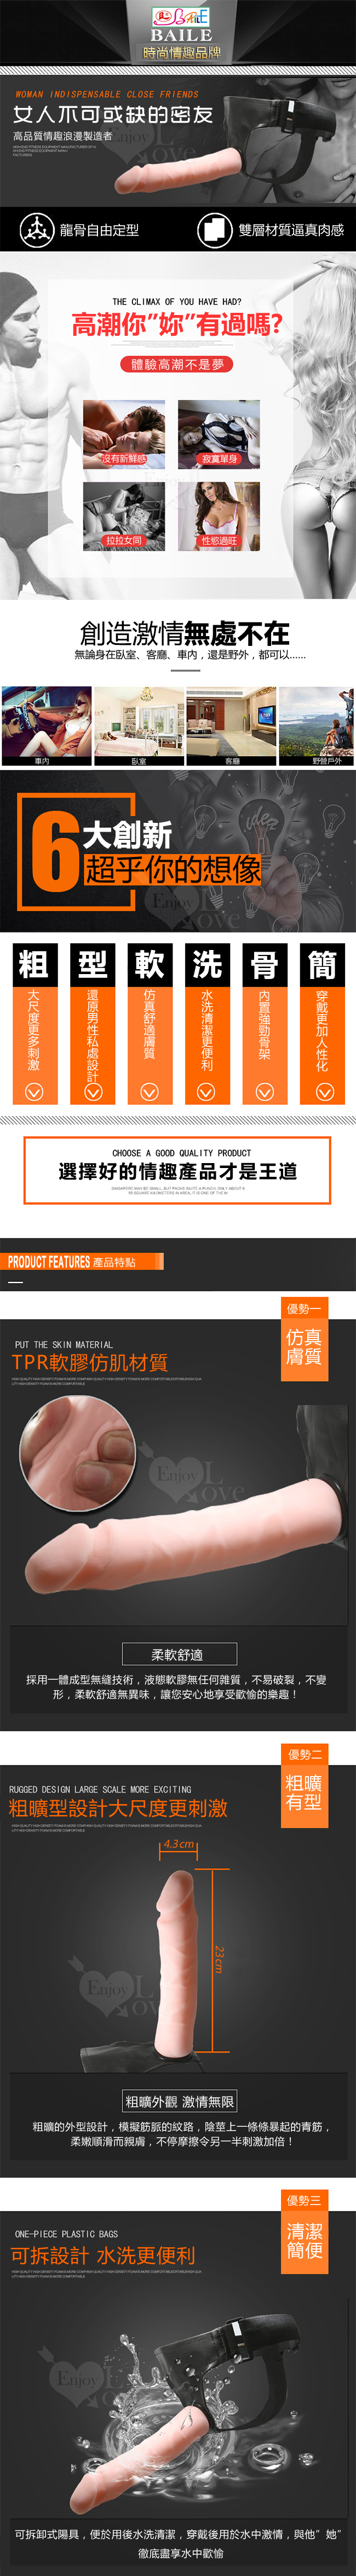 【BAILE】ULTRA 超 - 大尺寸仿真膚質實心穿戴陽具﹝可彎曲定型﹞